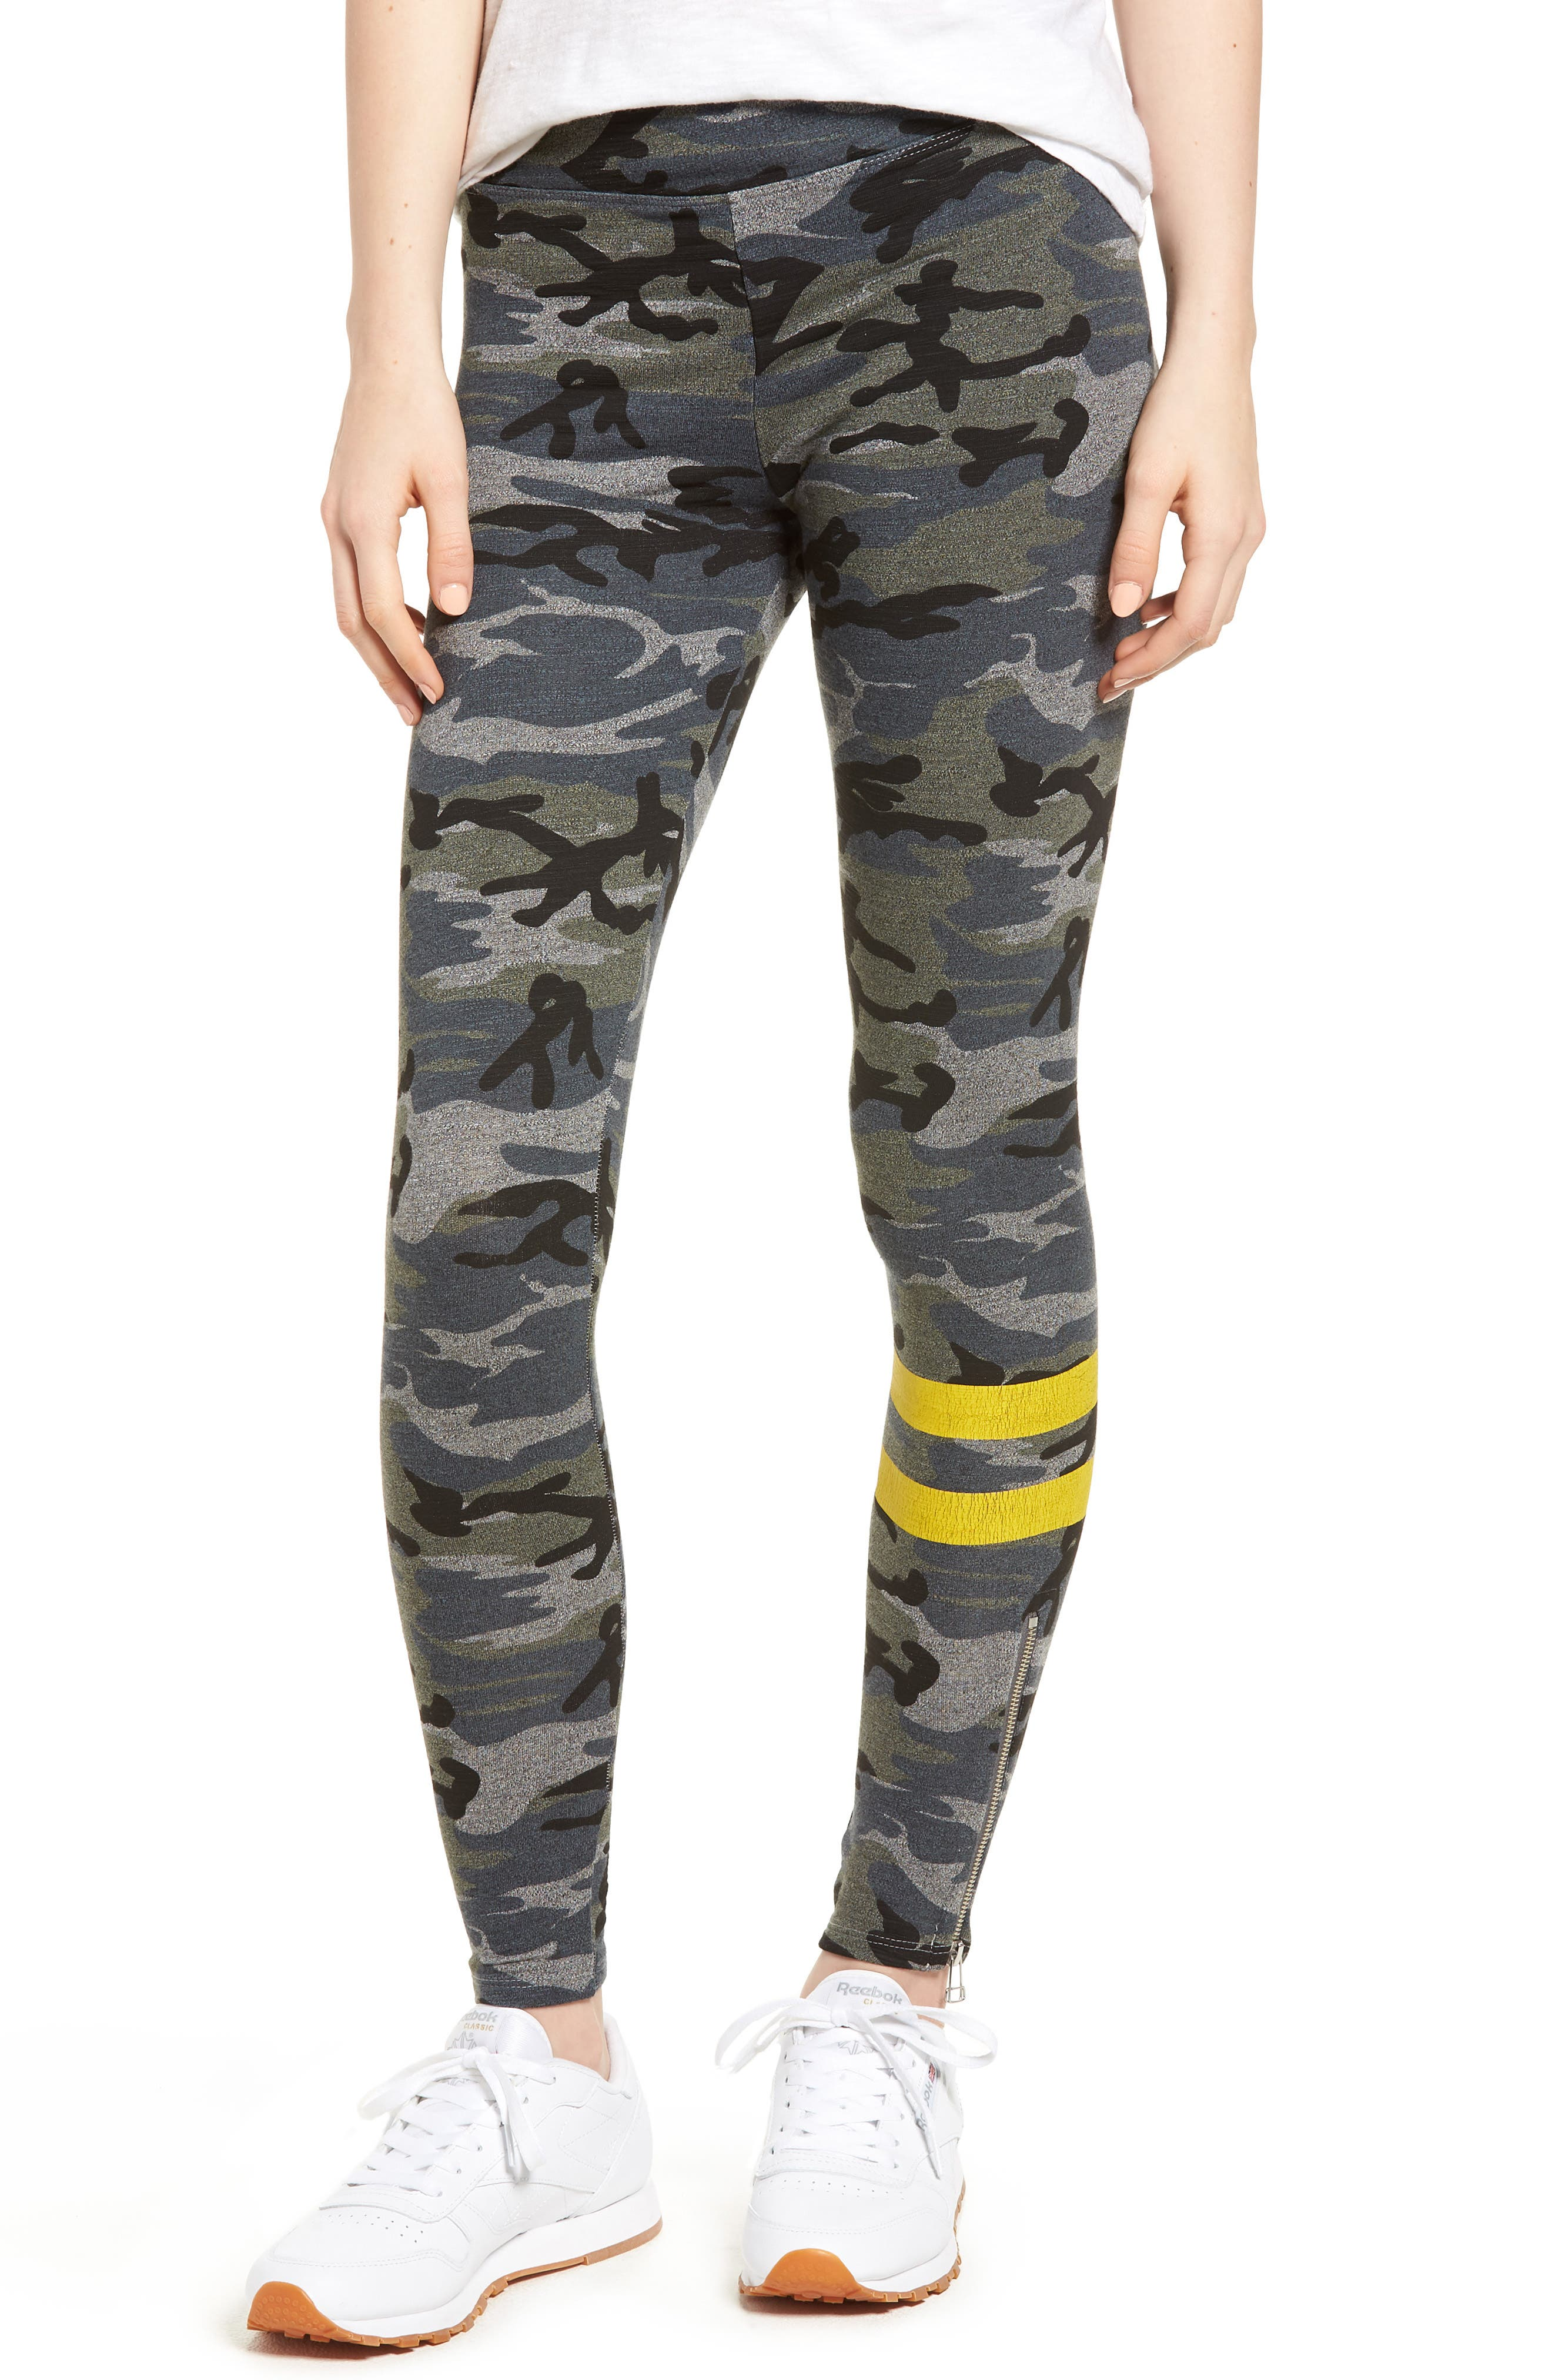 Stripe Camo Yoga Pants,                         Main,                         color, Grey